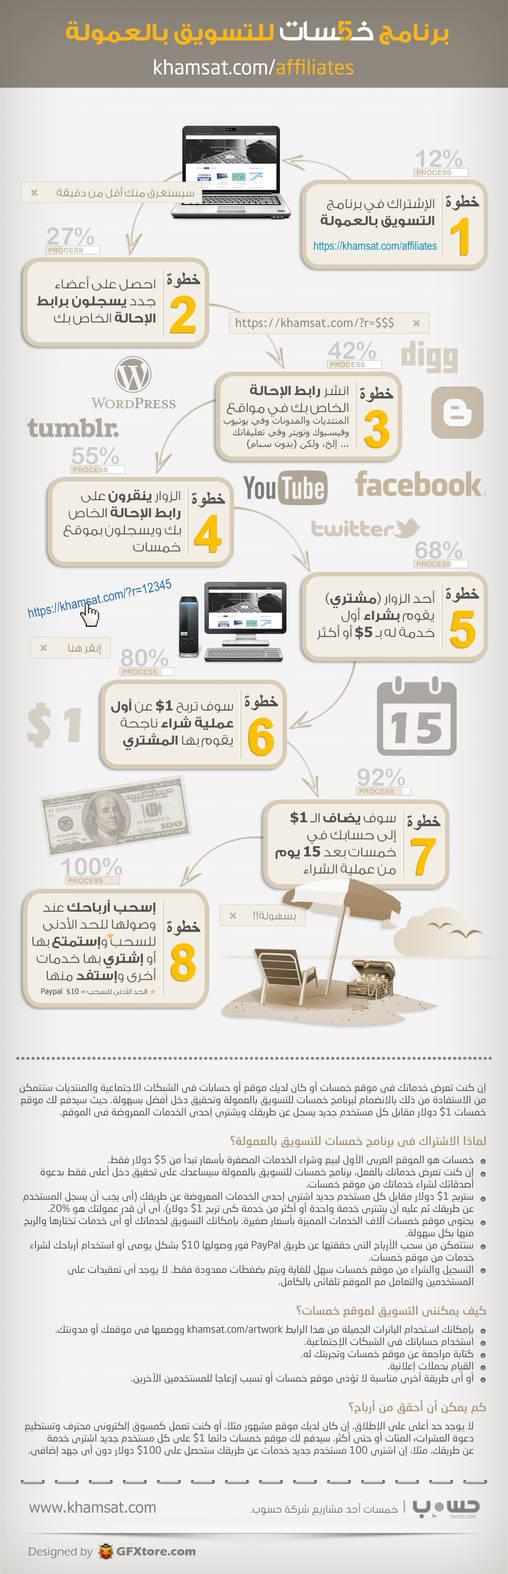 Khamsat.com Affiliates Program